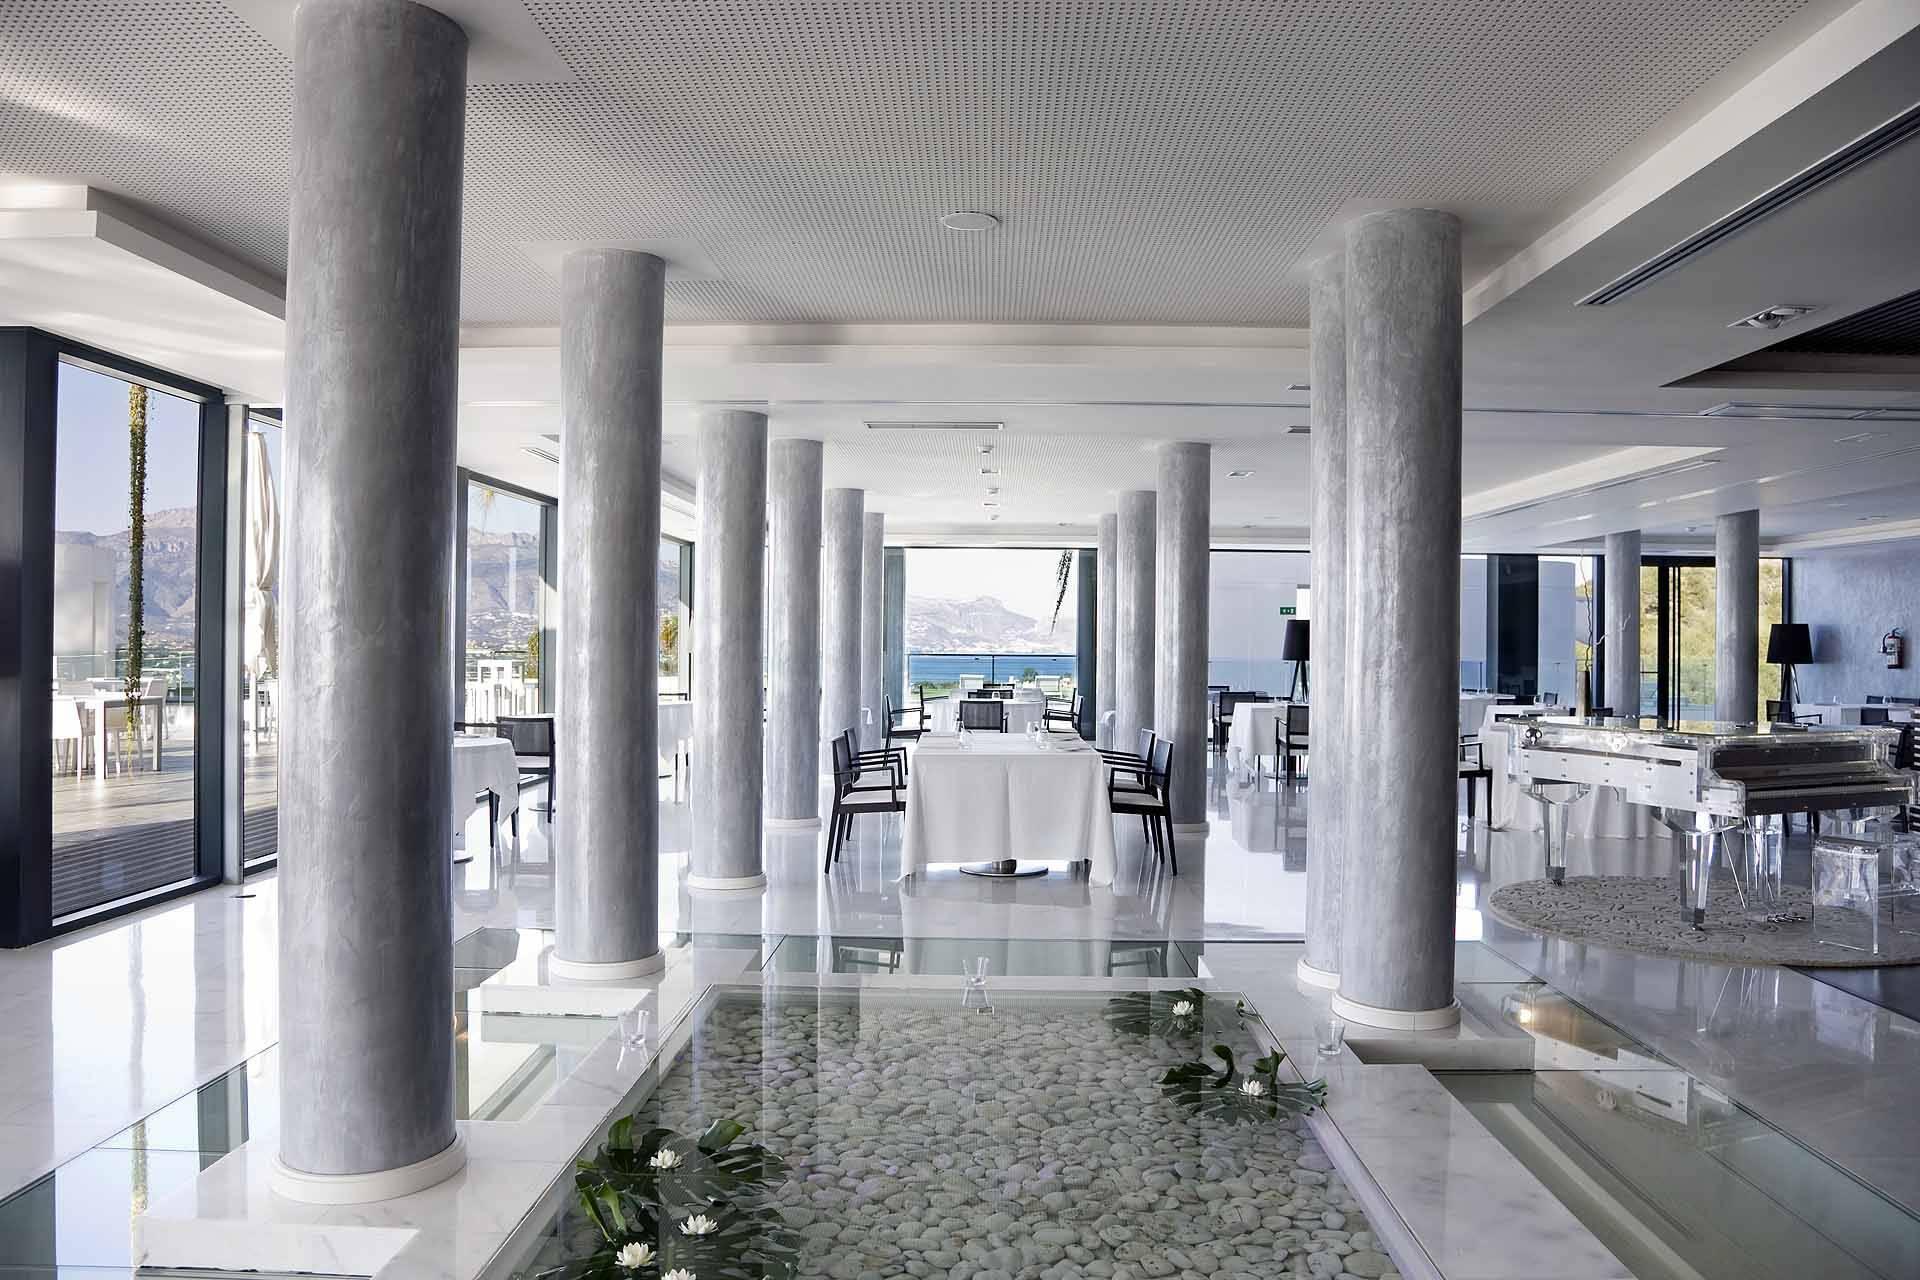 ShaWellness Restaurant Sejour AlicanteJPG